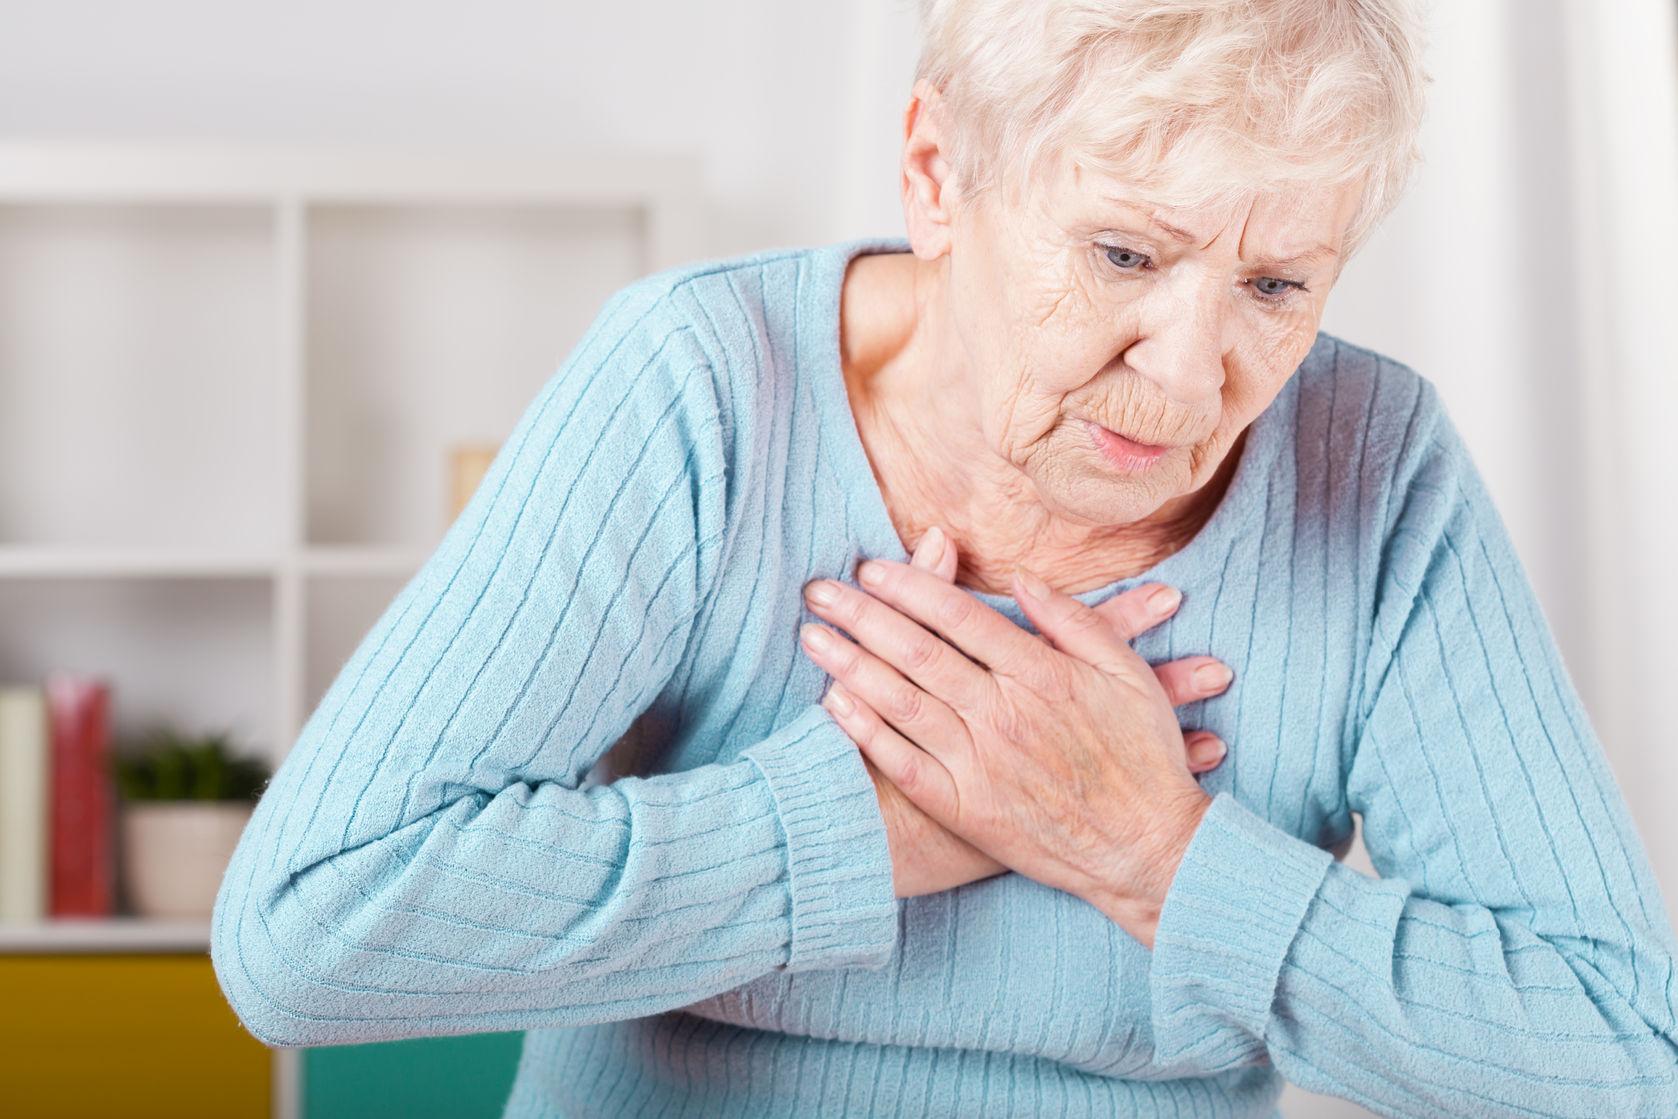 dolor angina de pecho